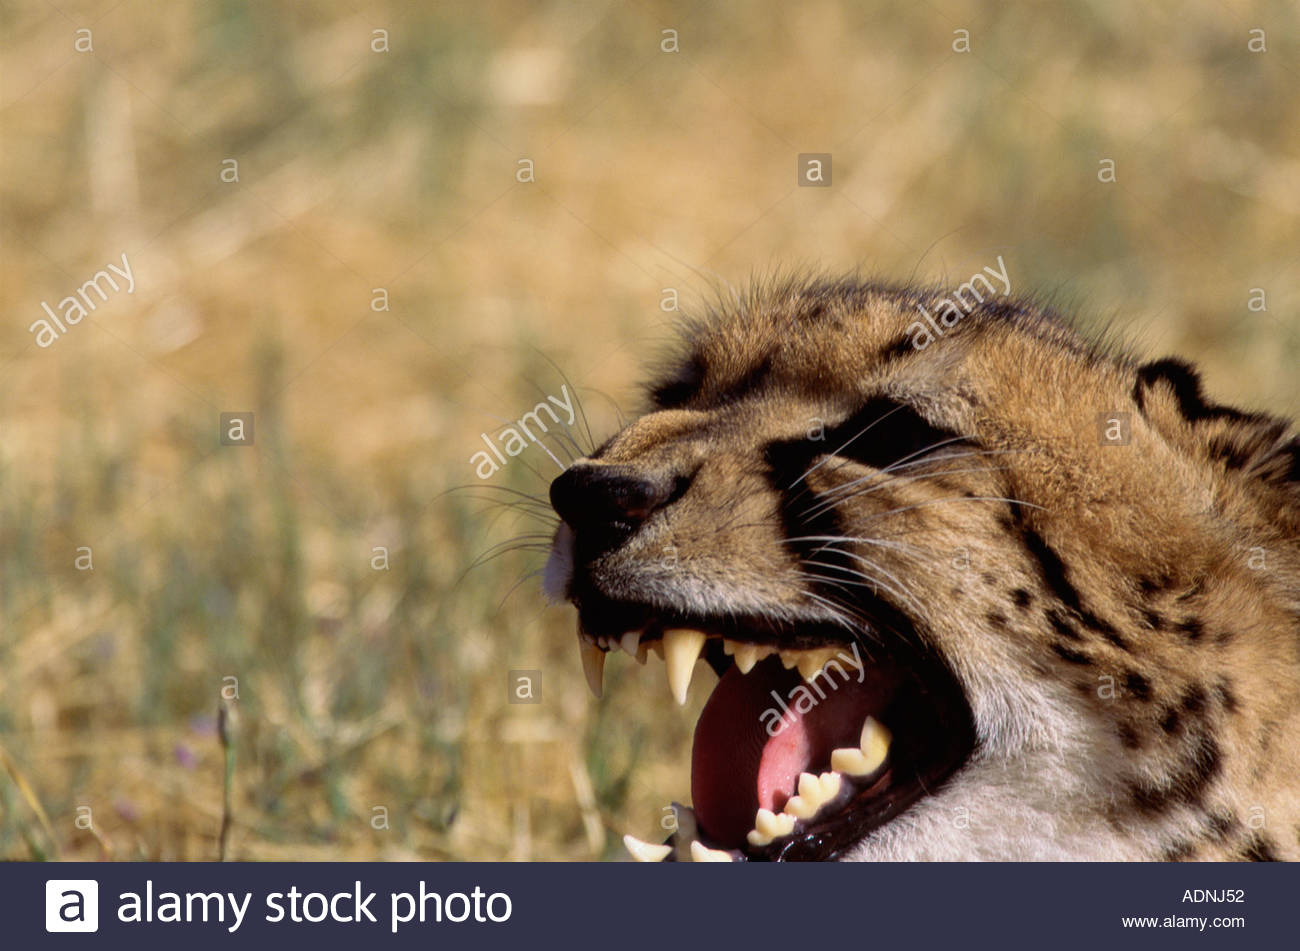 Close-up of a cheetah snarling (Acinonyx jubatus) - Stock Image